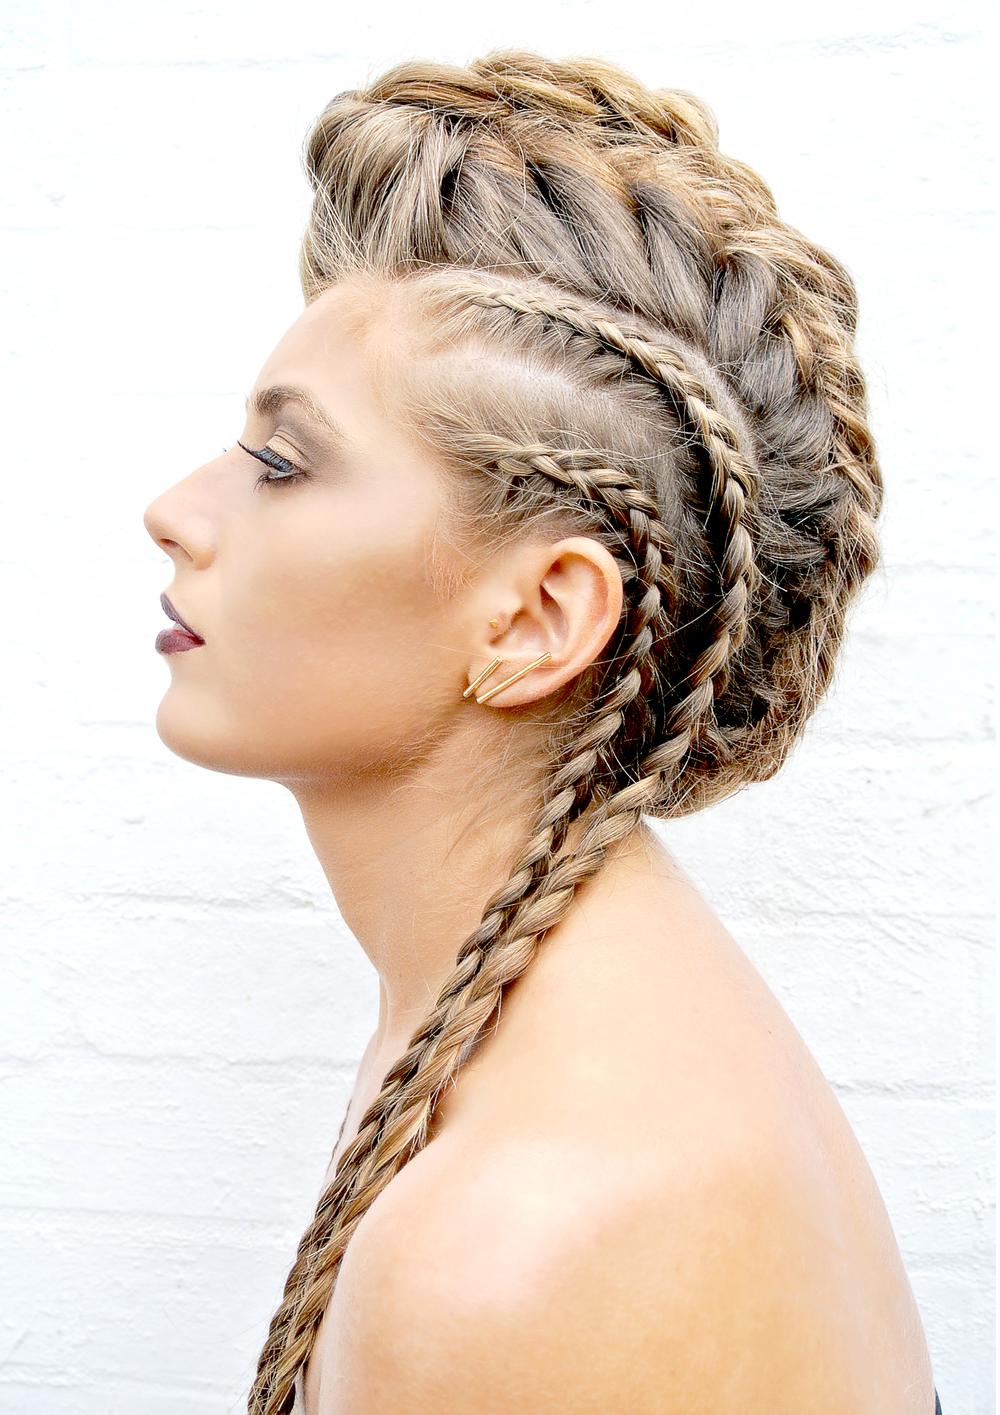 portrait-photography-hair